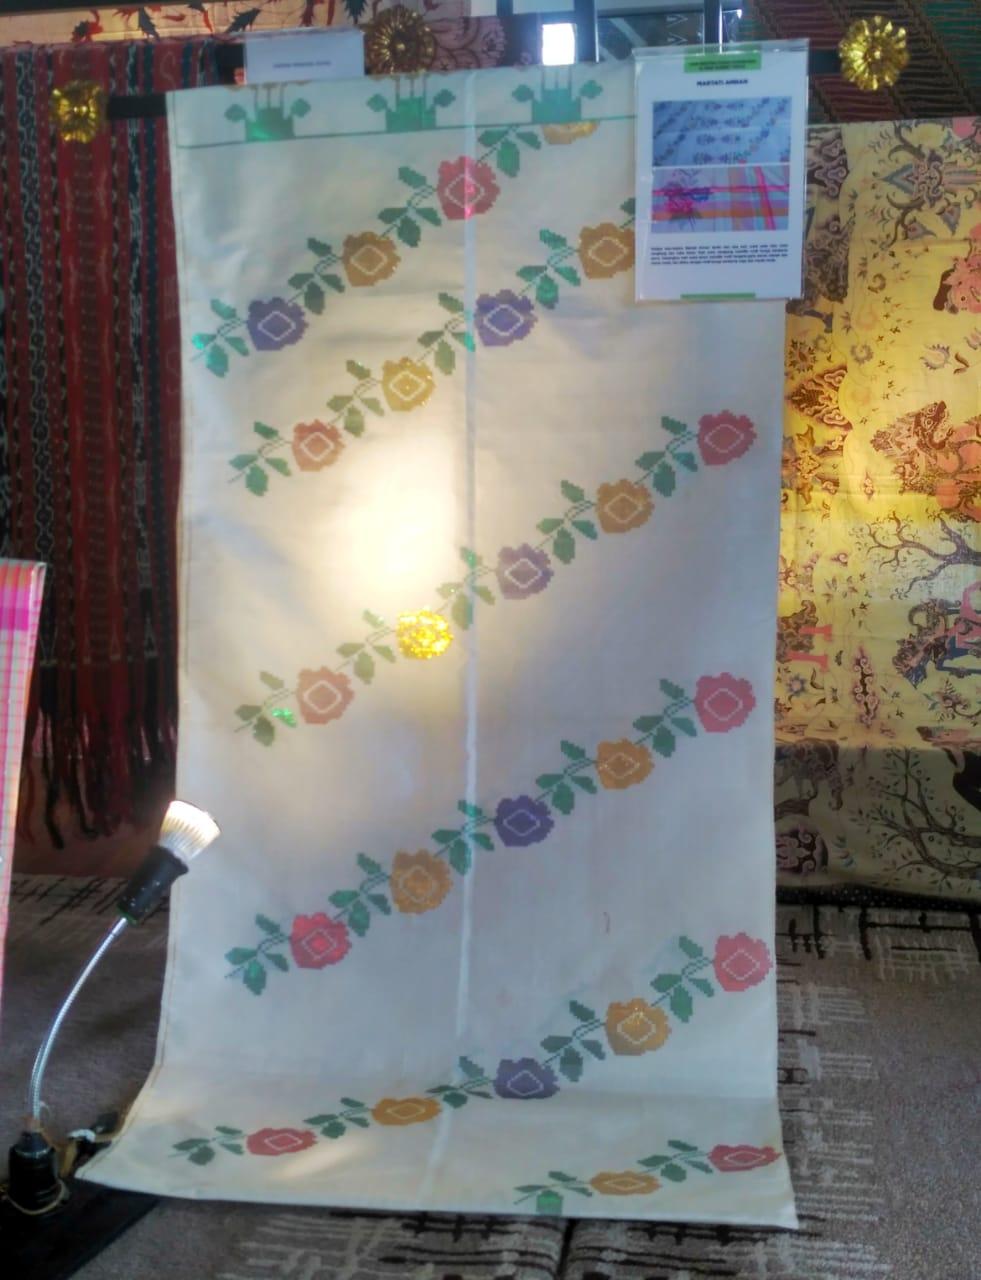 Kain sutra Sengkang » Budaya Indonesia